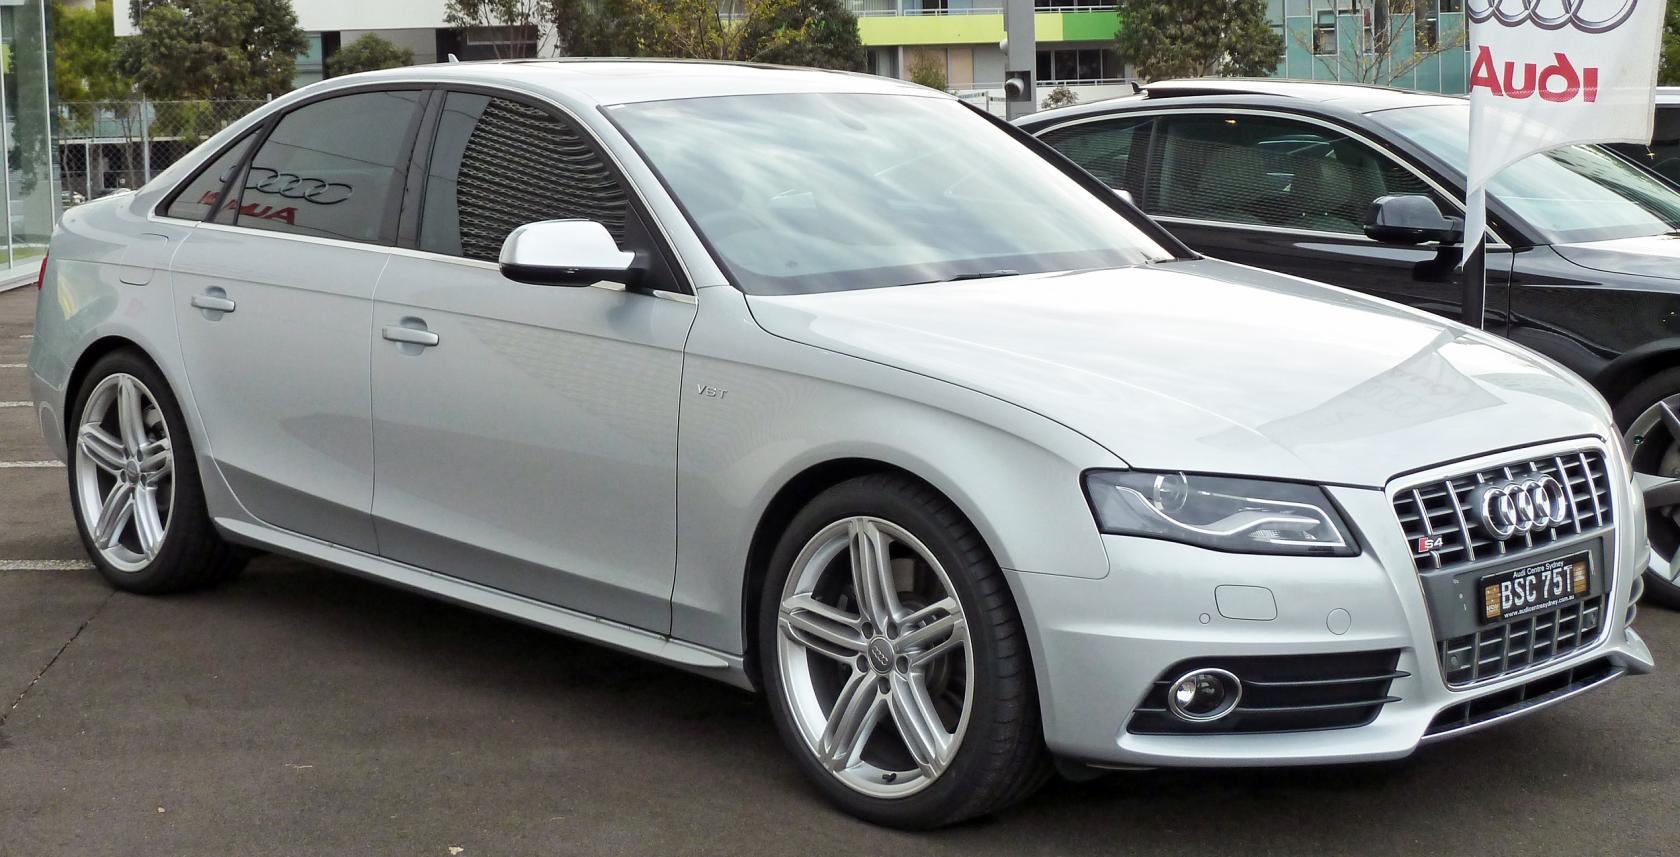 Audi-S4-B8-1